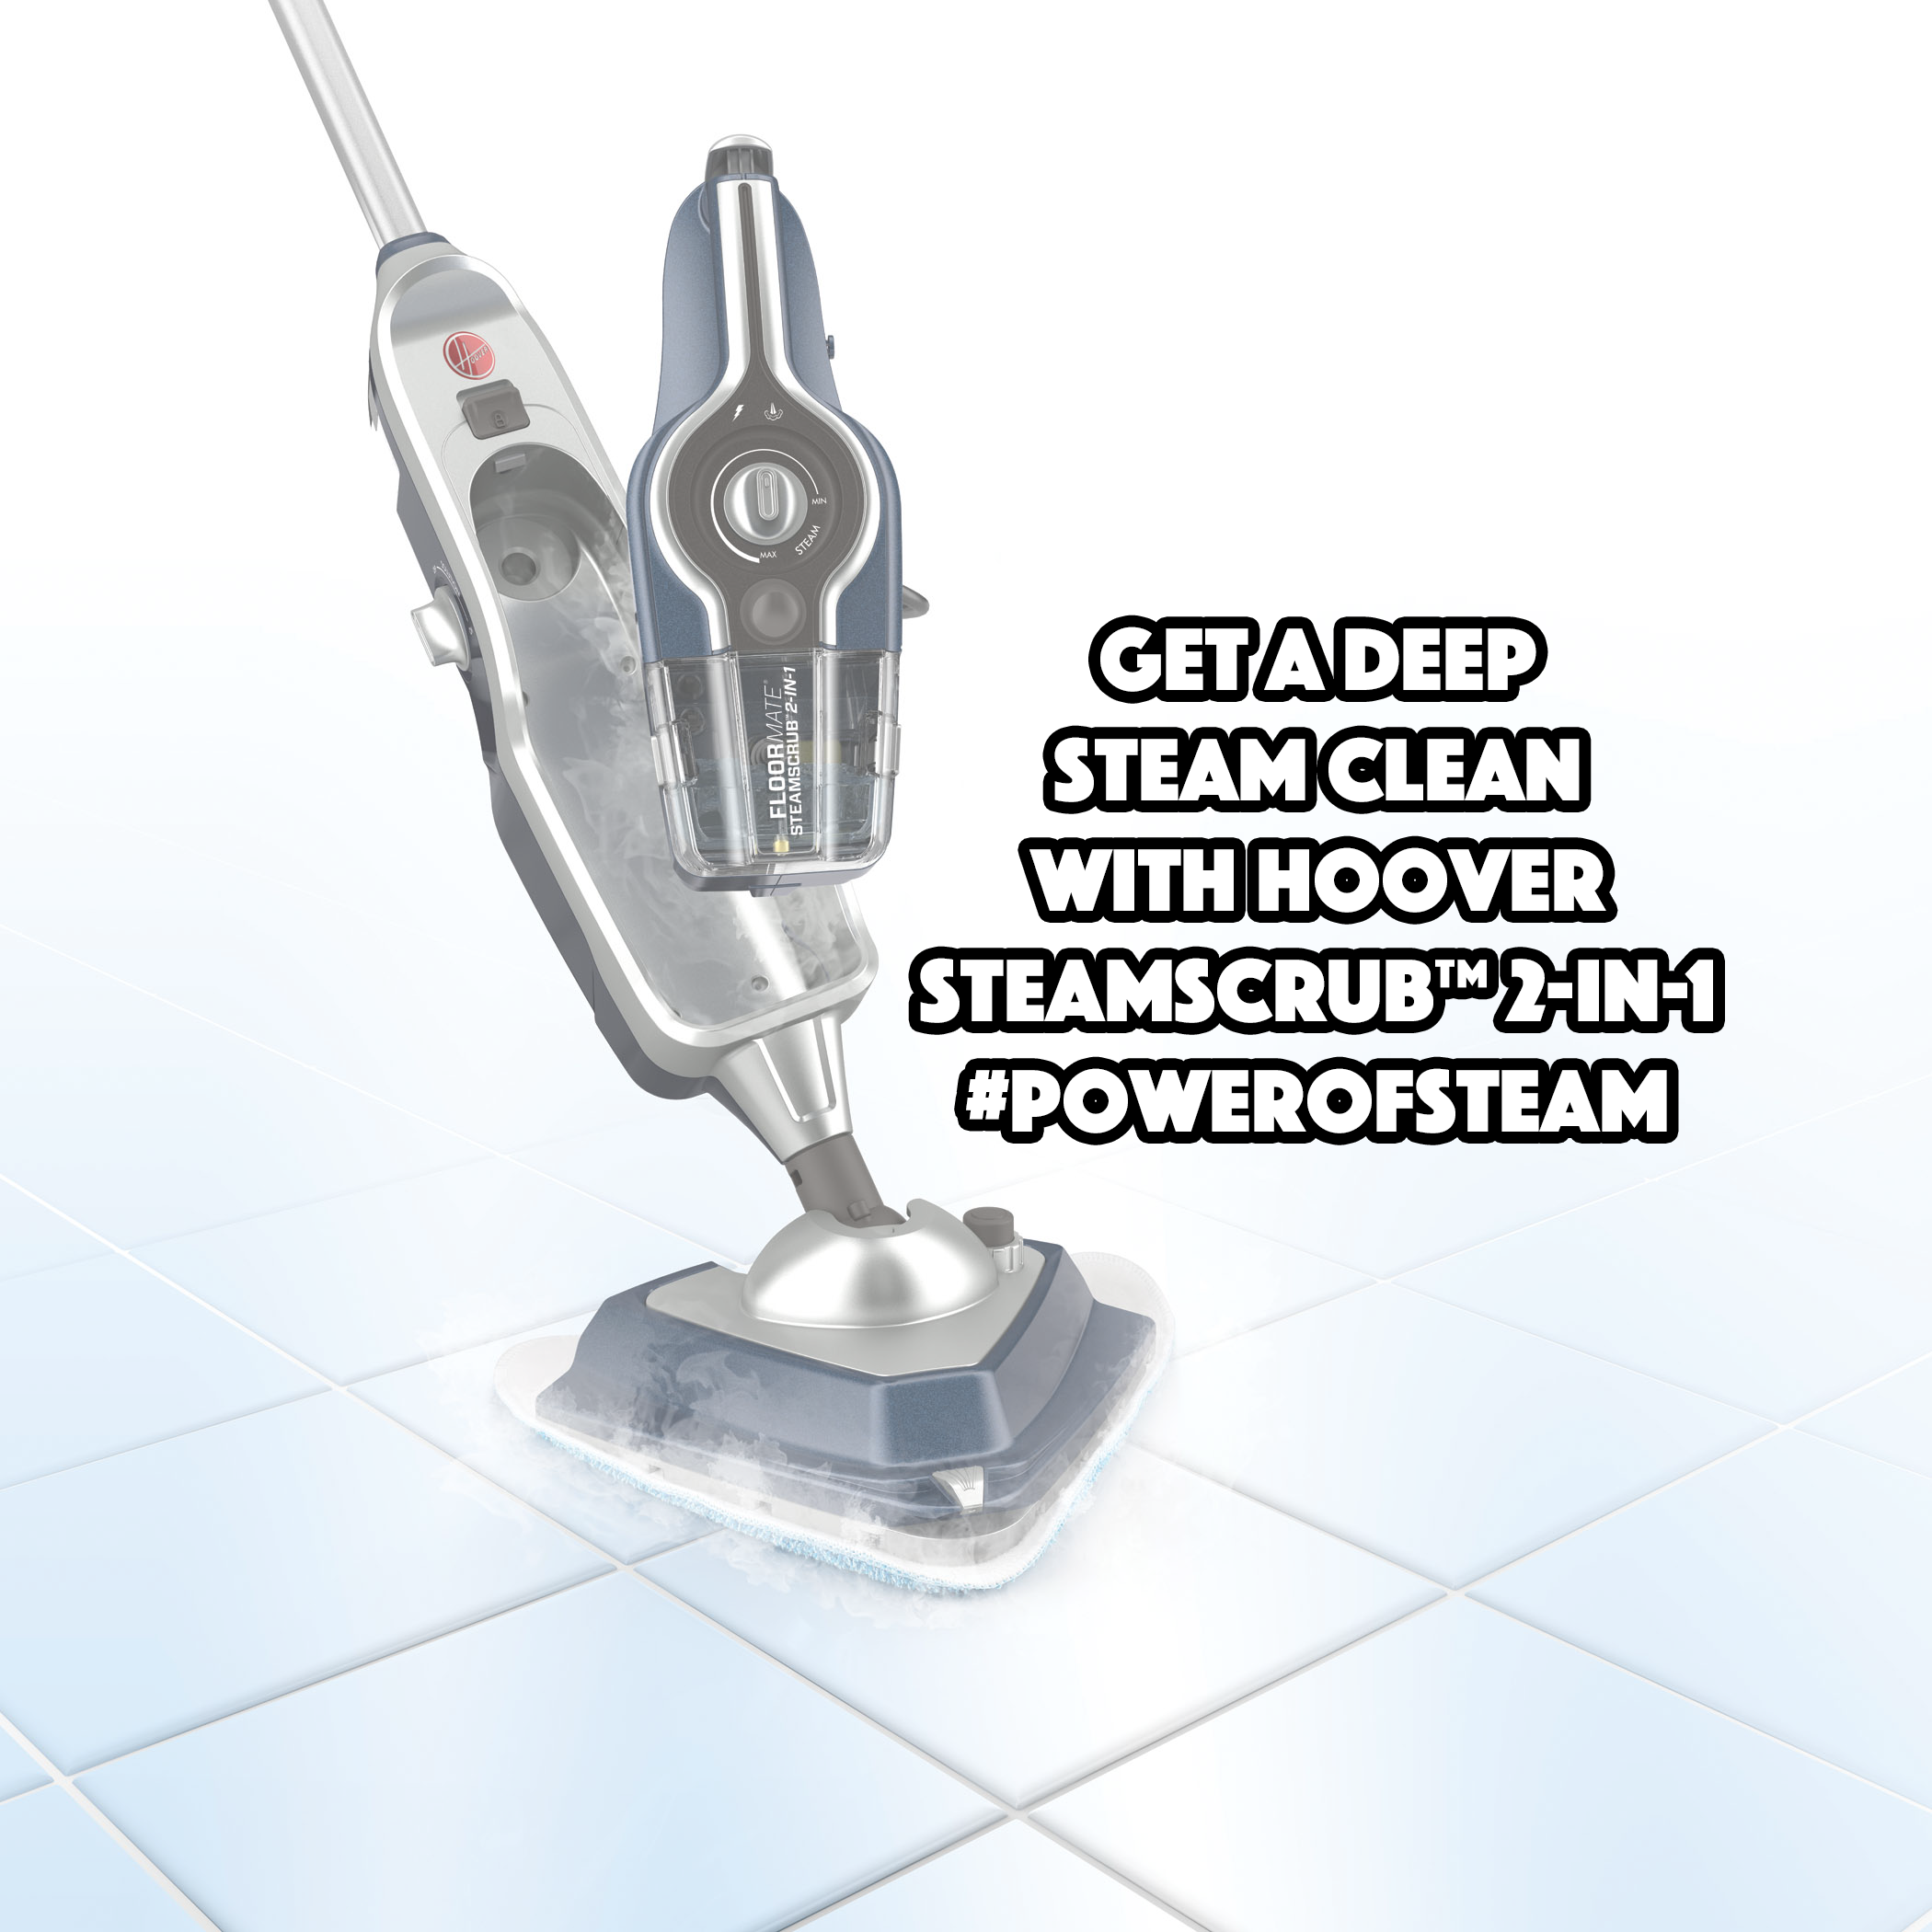 Get a Deep Steam Clean with Hoover SteamScrub™ 2-IN-1 #PowerofSteam